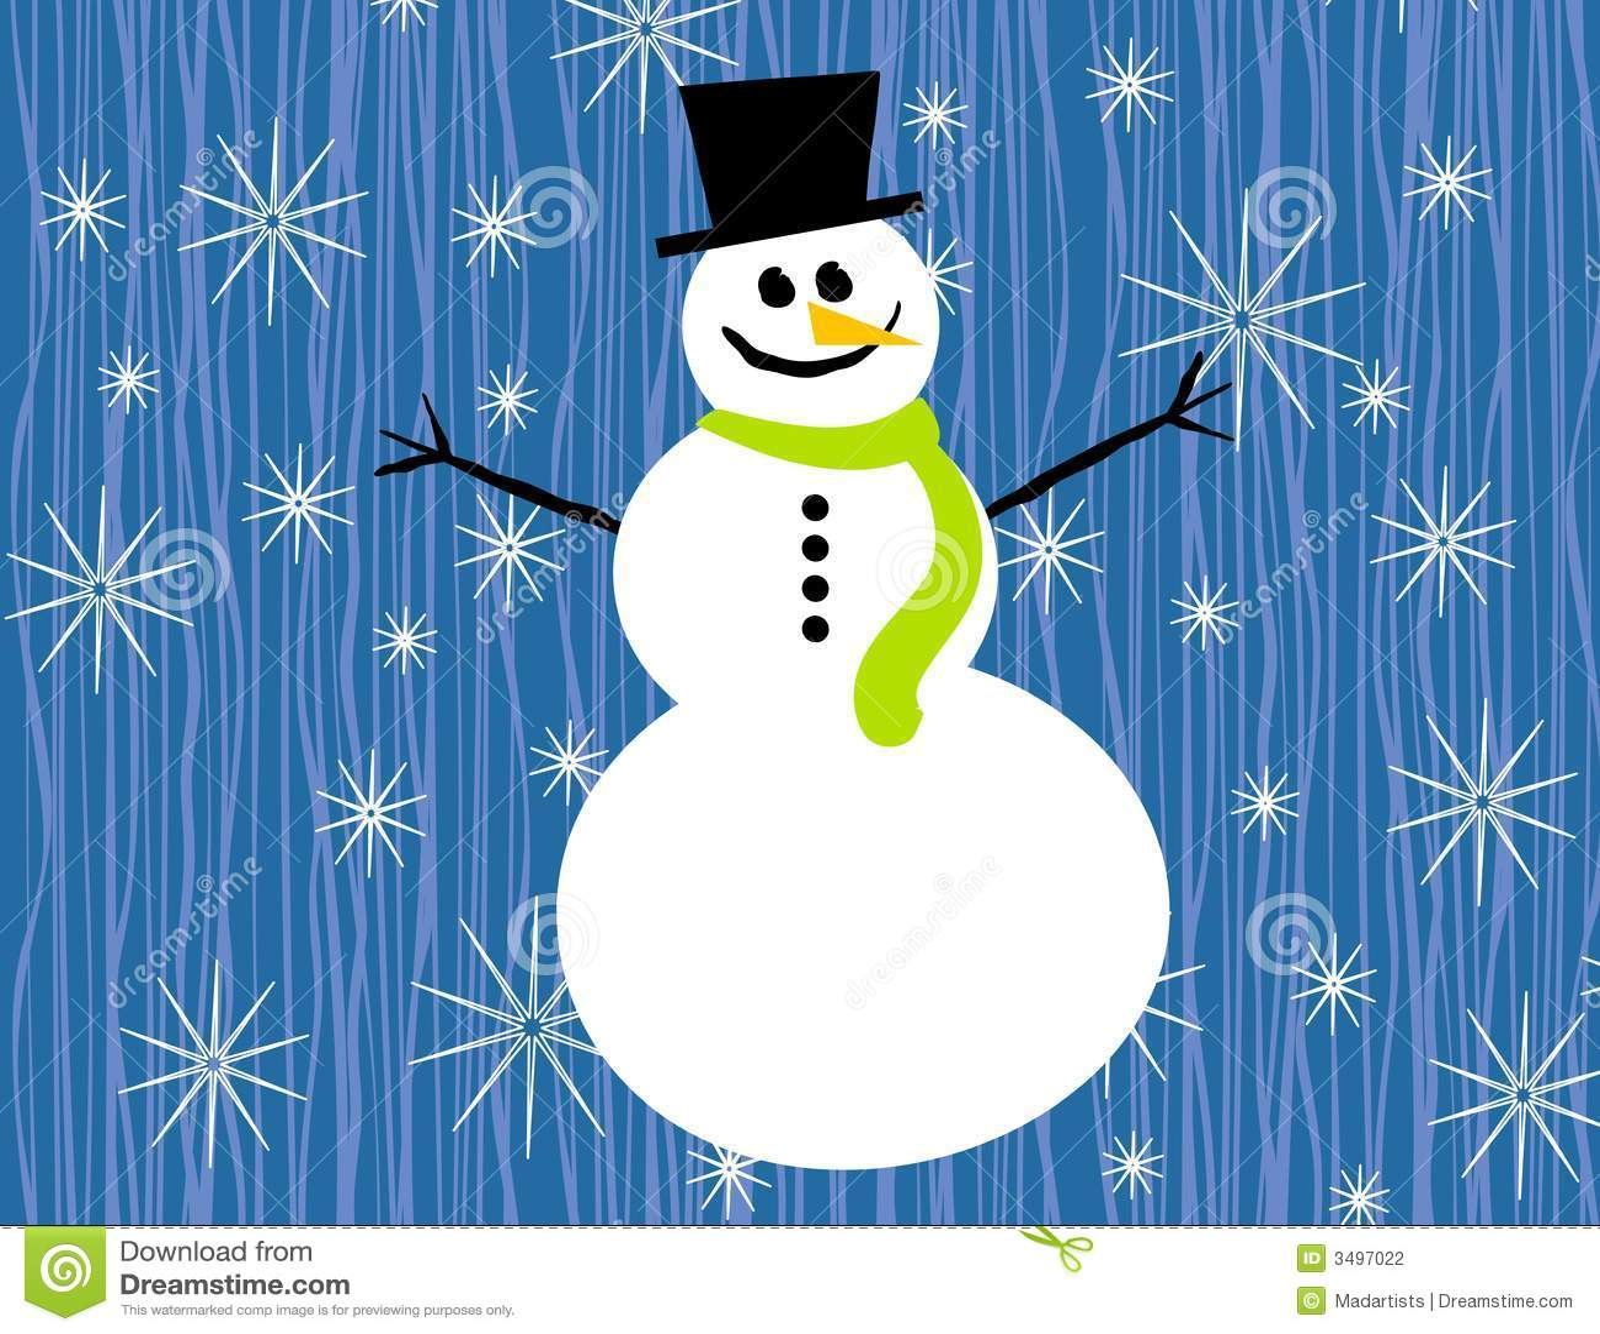 Blue Mountain Christmas Cards